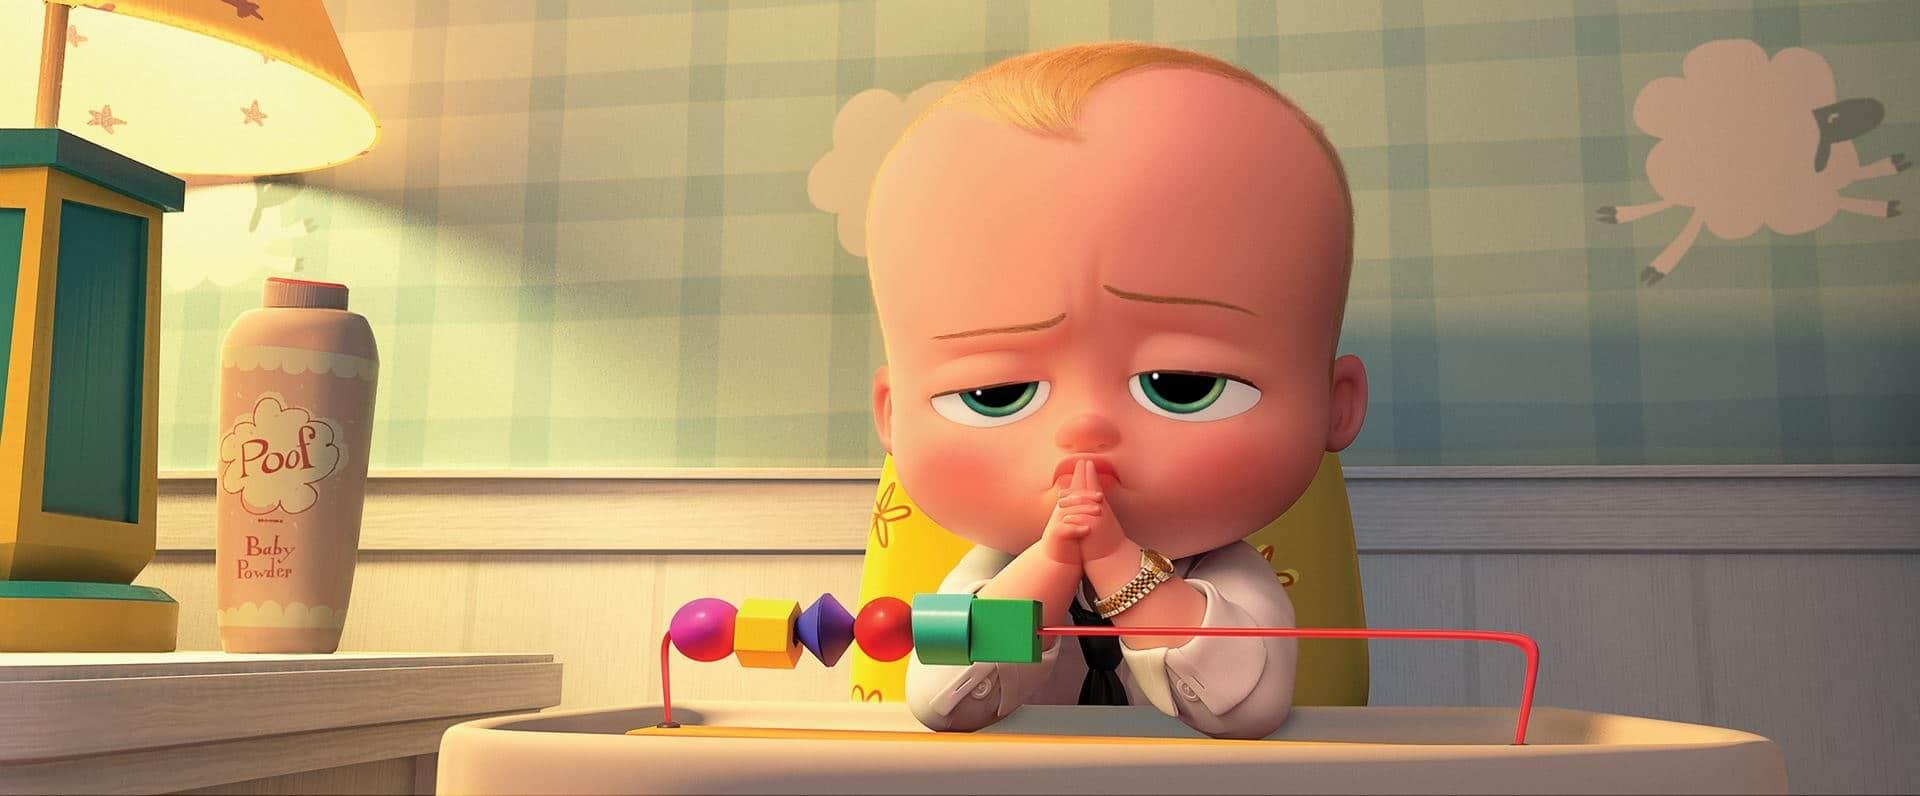 Netflix anuncia s rie de o poderoso chefinho nerdbunker - Baby animation wallpaper ...